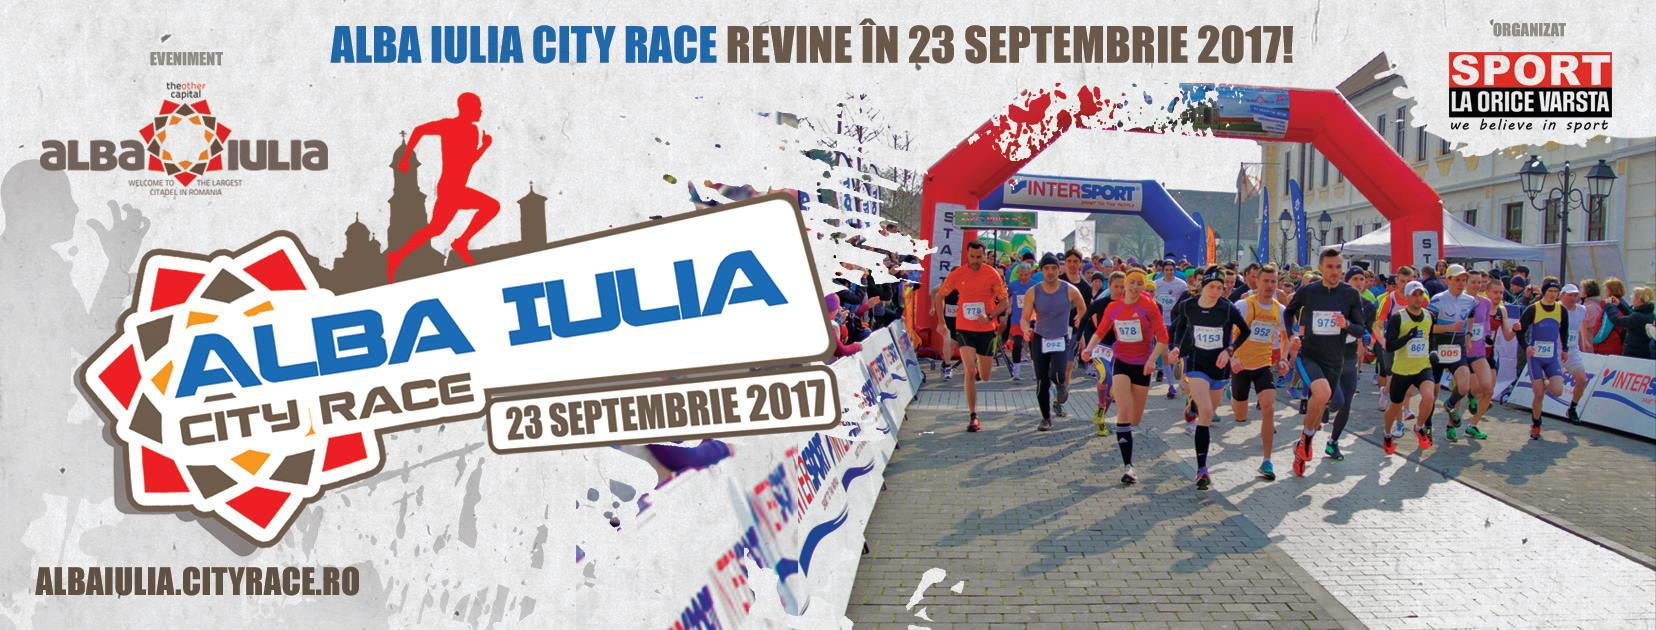 Sport si istorie la Alba Iulia City Race. aimx.ro are pentru voi o inscriere gratuita!